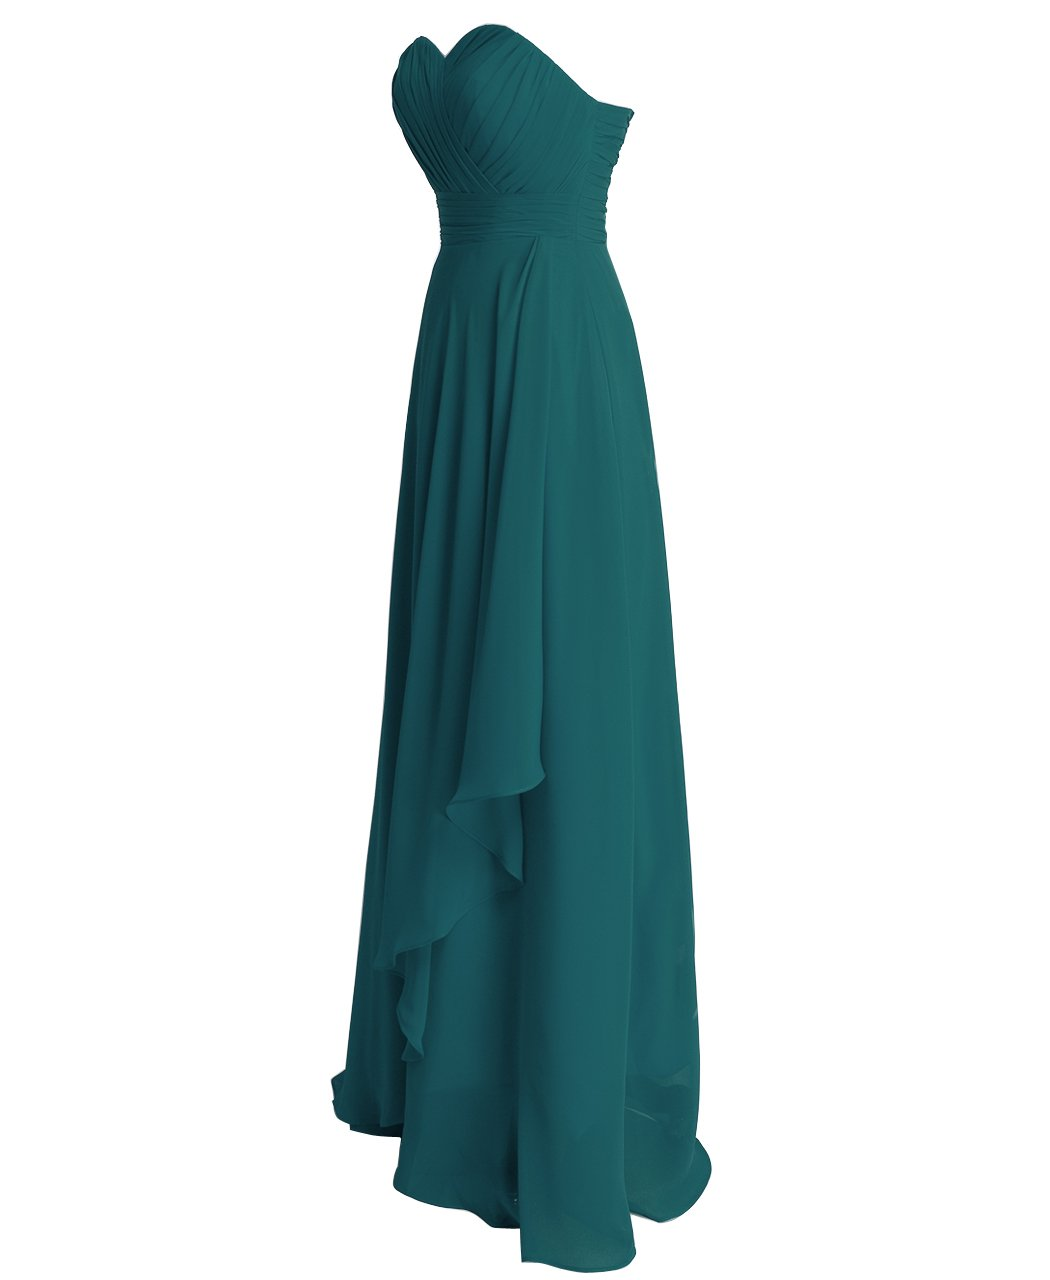 FAIRY COUPLE Chiffon Strapless Bridesmaids Dress D0072 at Amazon ...